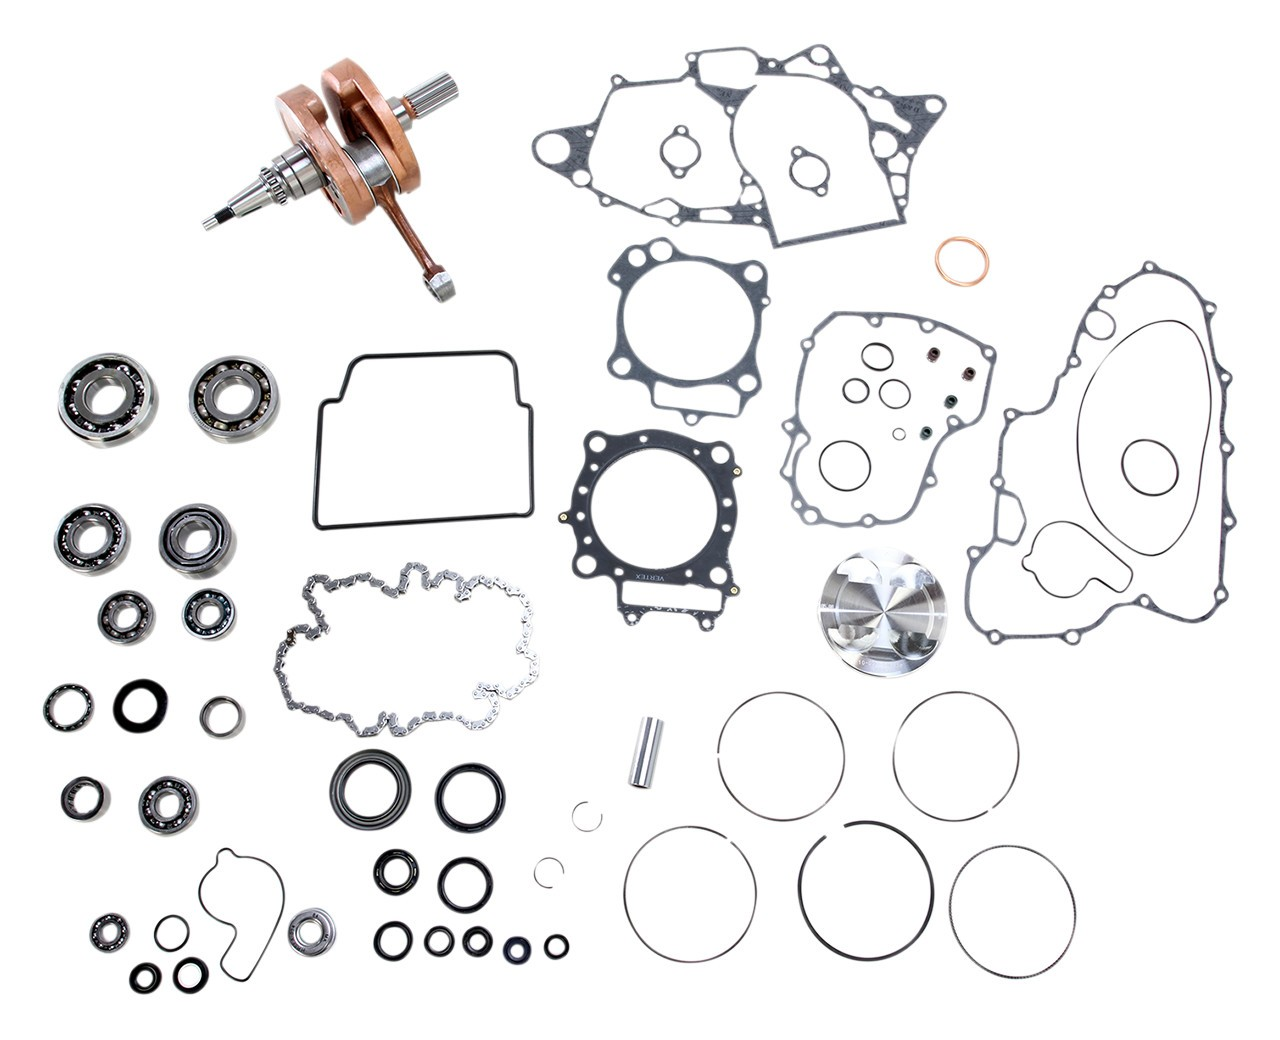 Wrench Rabbit Complete Engine Rebuild Kit 10 3599 Off Revzilla 2000 Rm 250 Diagram